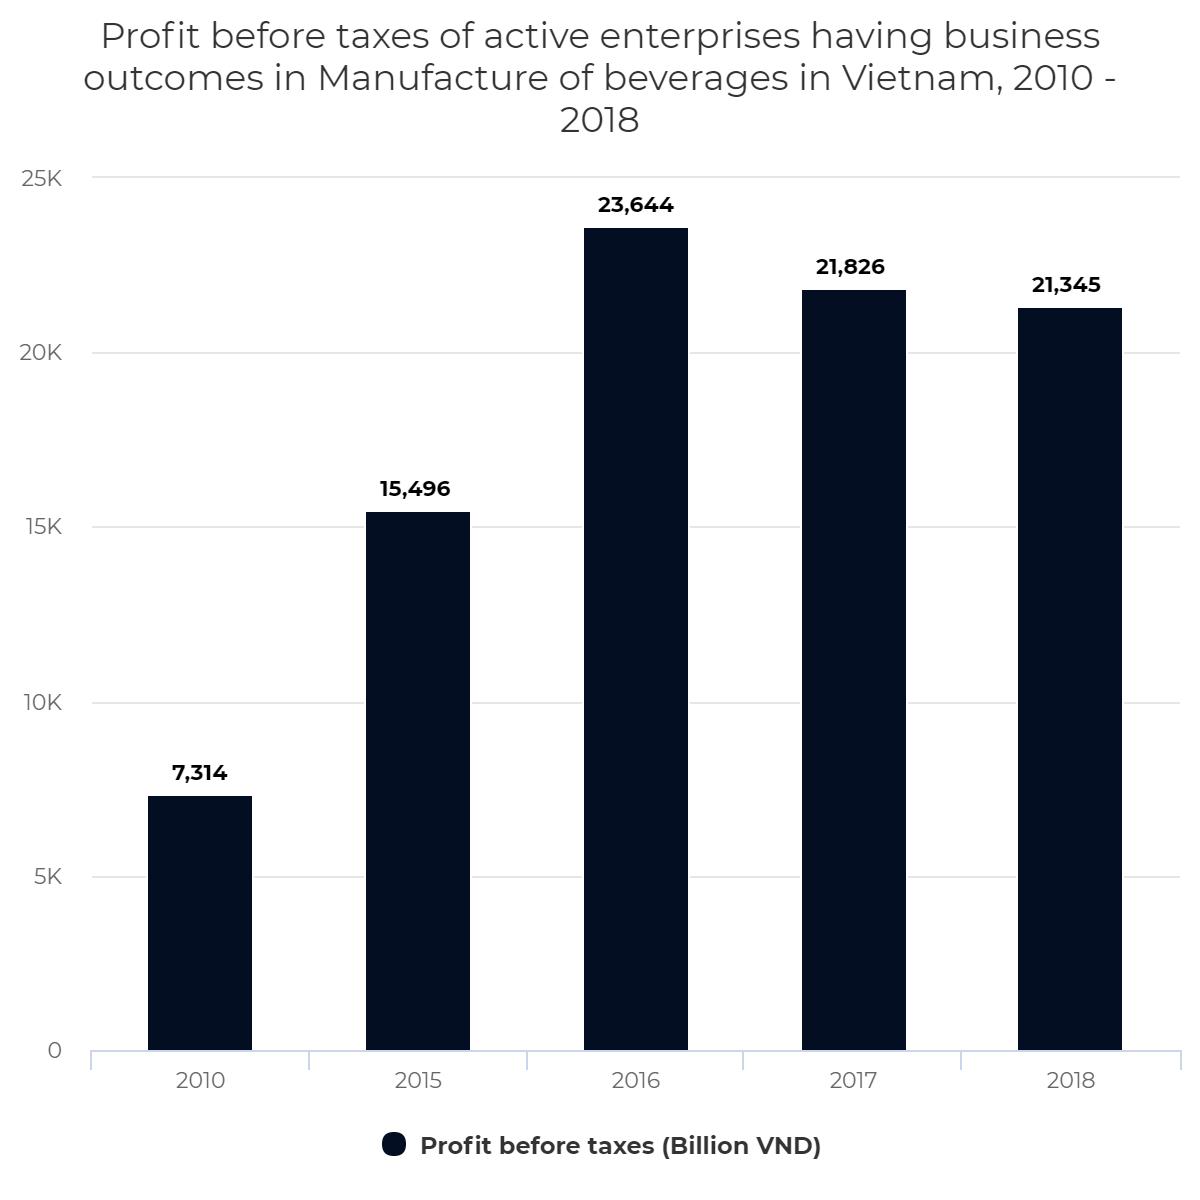 Profit before tax of active enterprises in Manufacture of beverages, Vietnam, 2010 – 2018